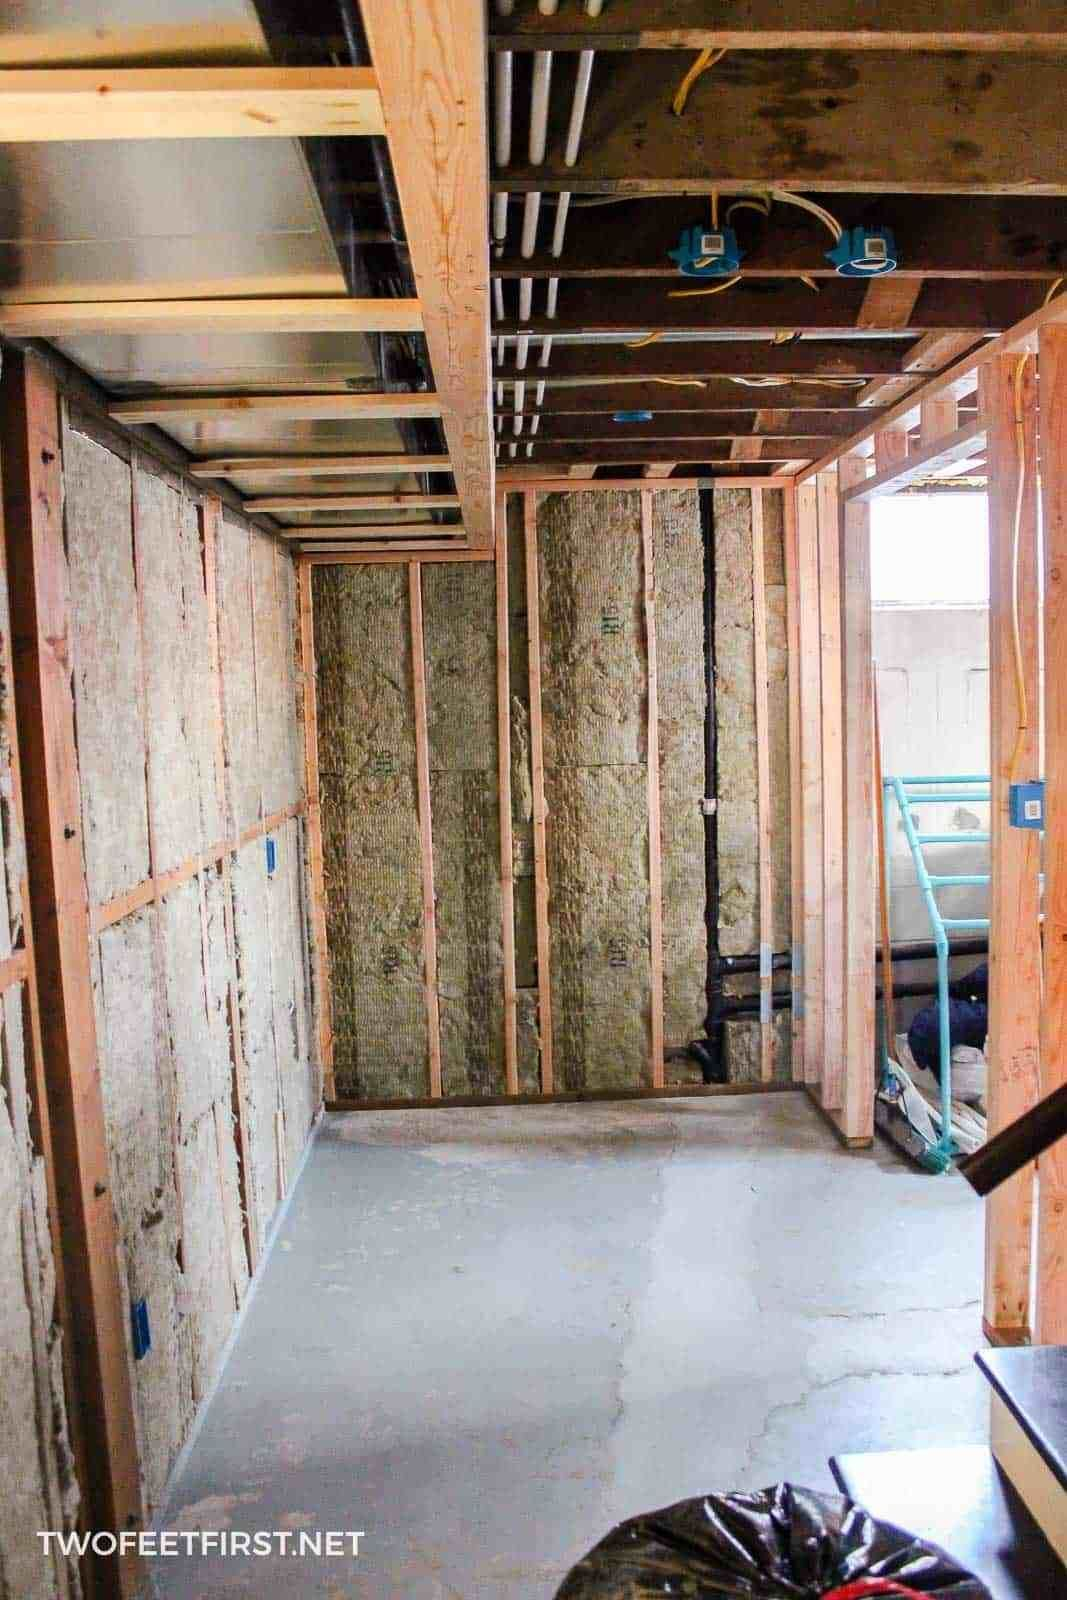 Insulating And Framing A Basement Basement Ceiling Options Framing A Basement Framing Basement Walls Insulating Basement Walls